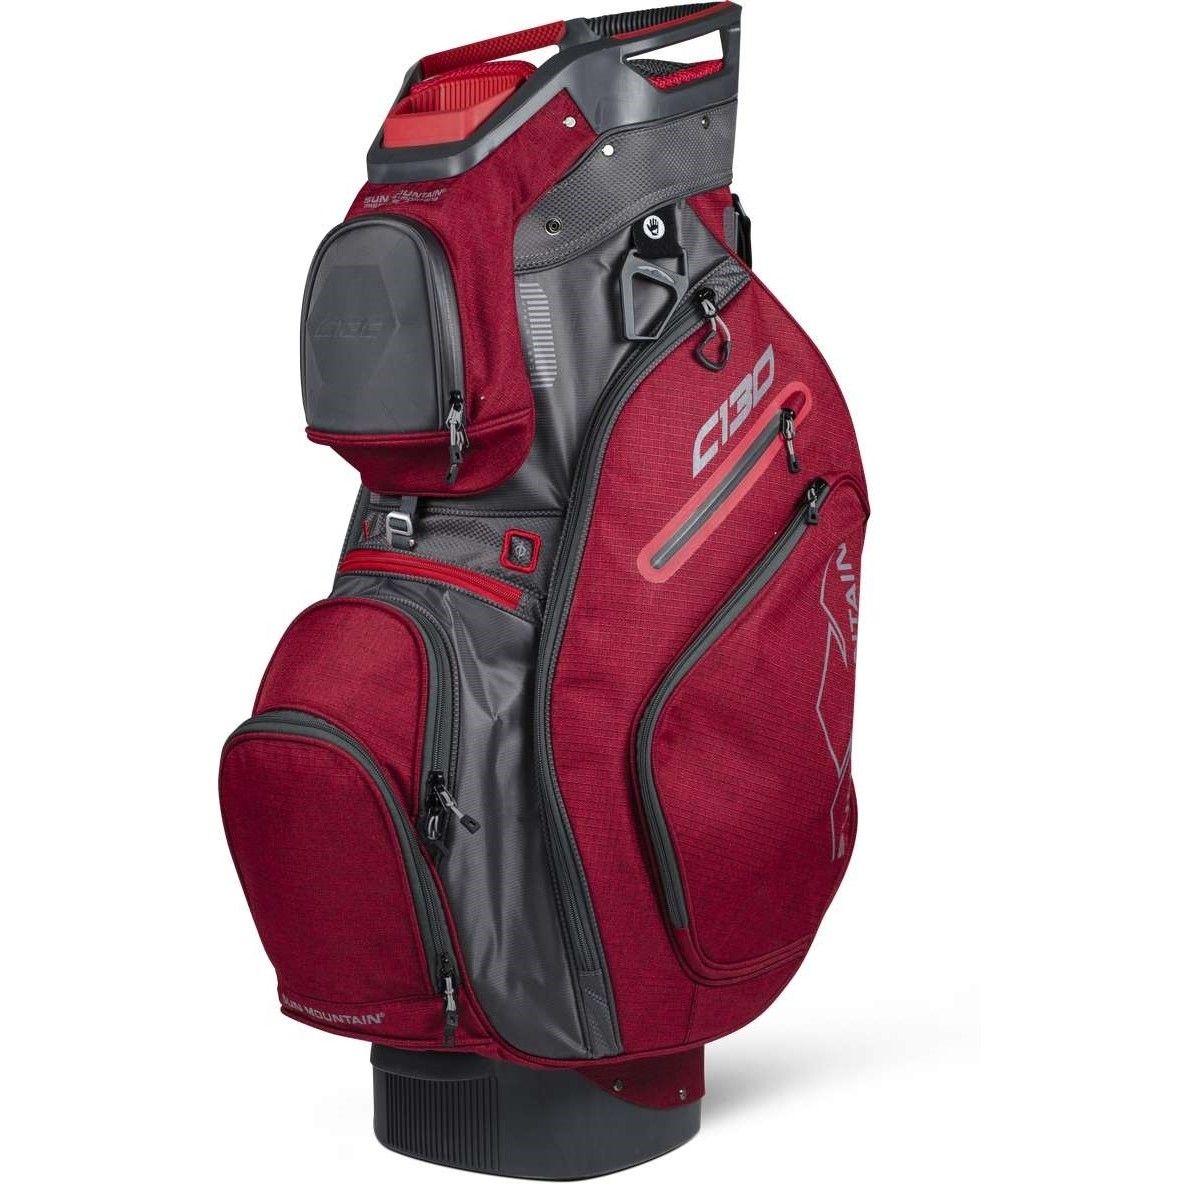 Sun Mountain C130 Cart Bag 2018 Chili Golf bags, Golf